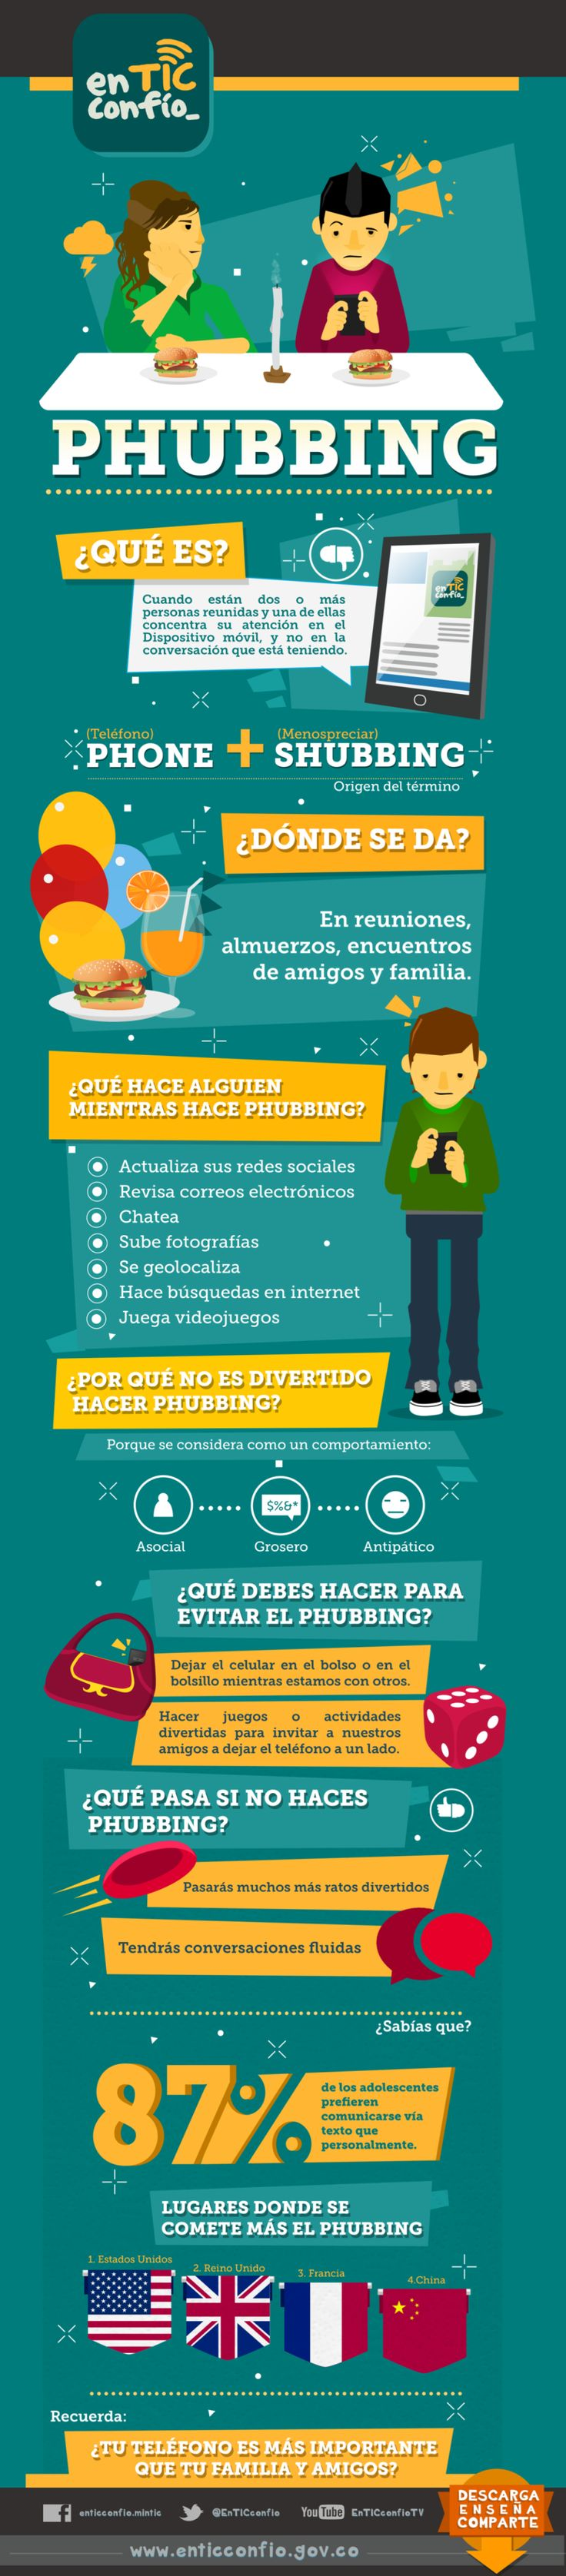 ¿Sabes que es el phubbing?  #infografia #infographic #phubbing